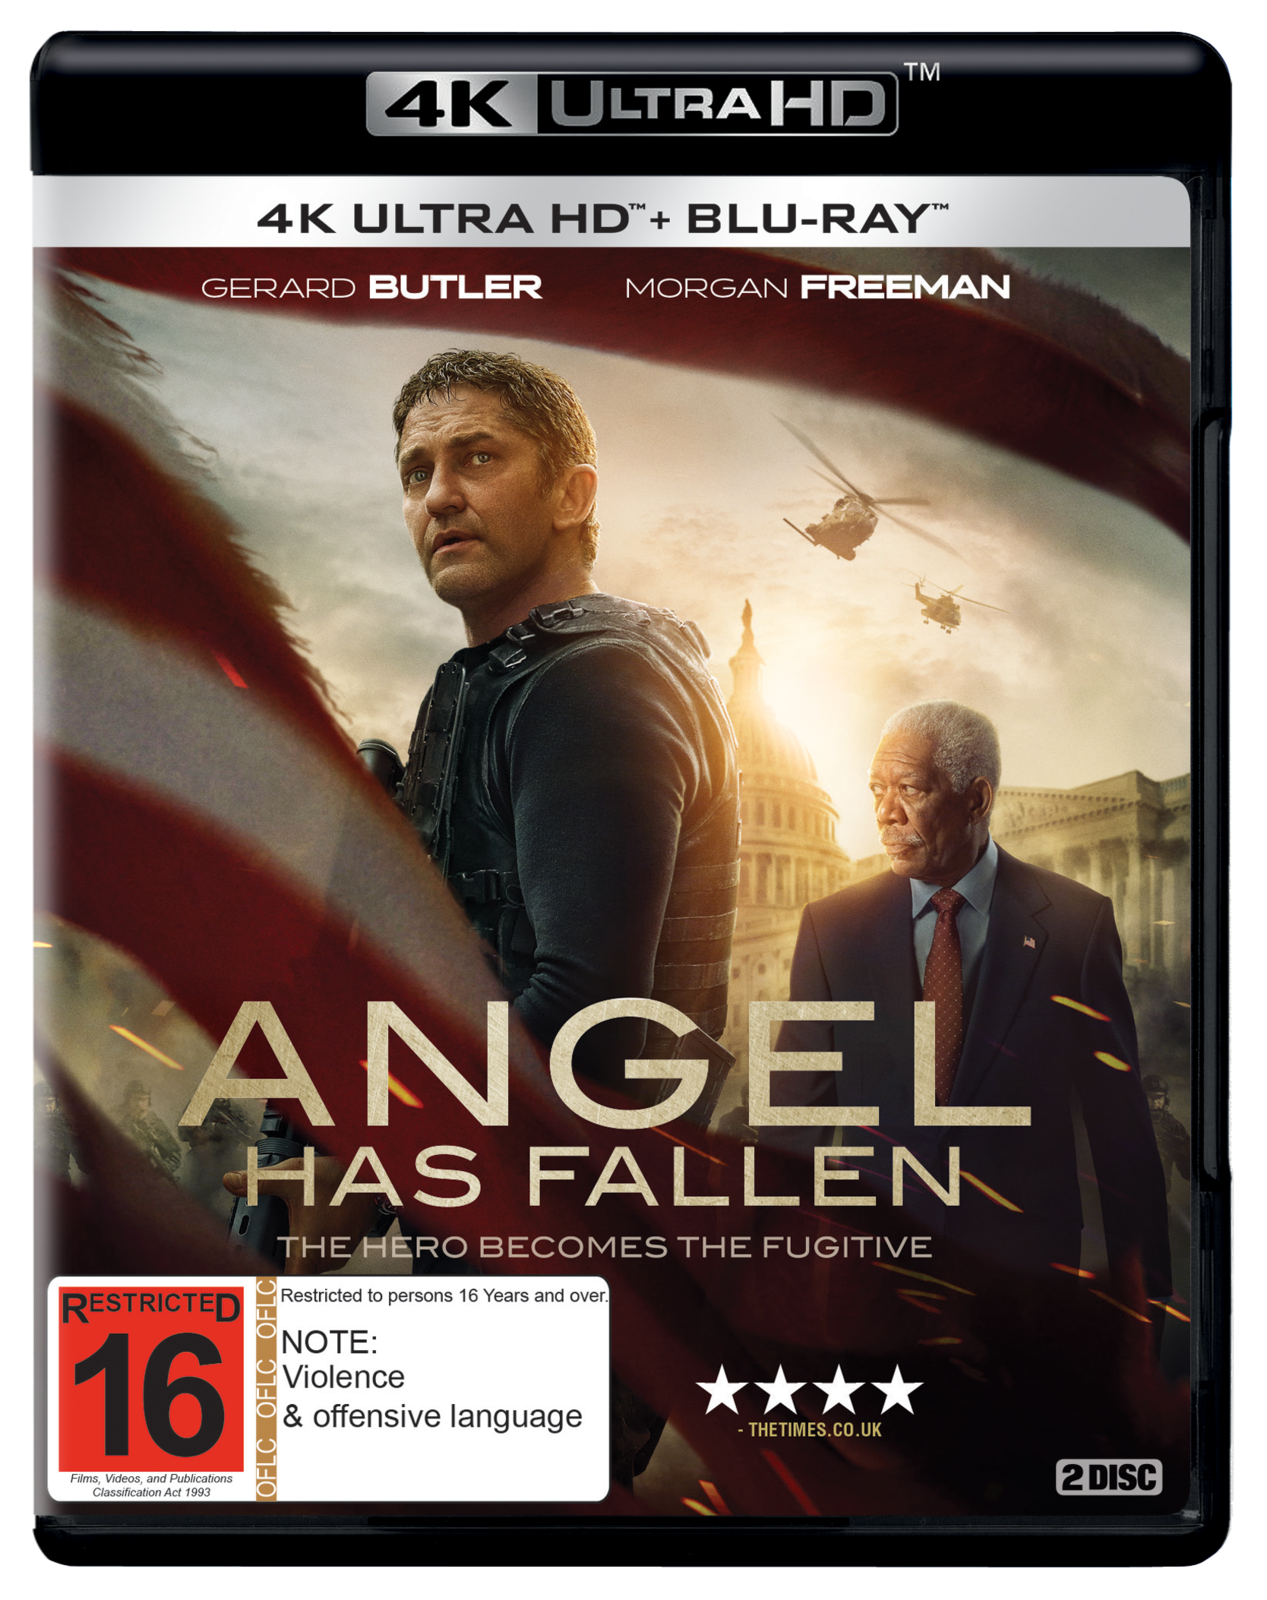 Angel Has Fallen (4K Ultra HD Blu-ray) on UHD Blu-ray image